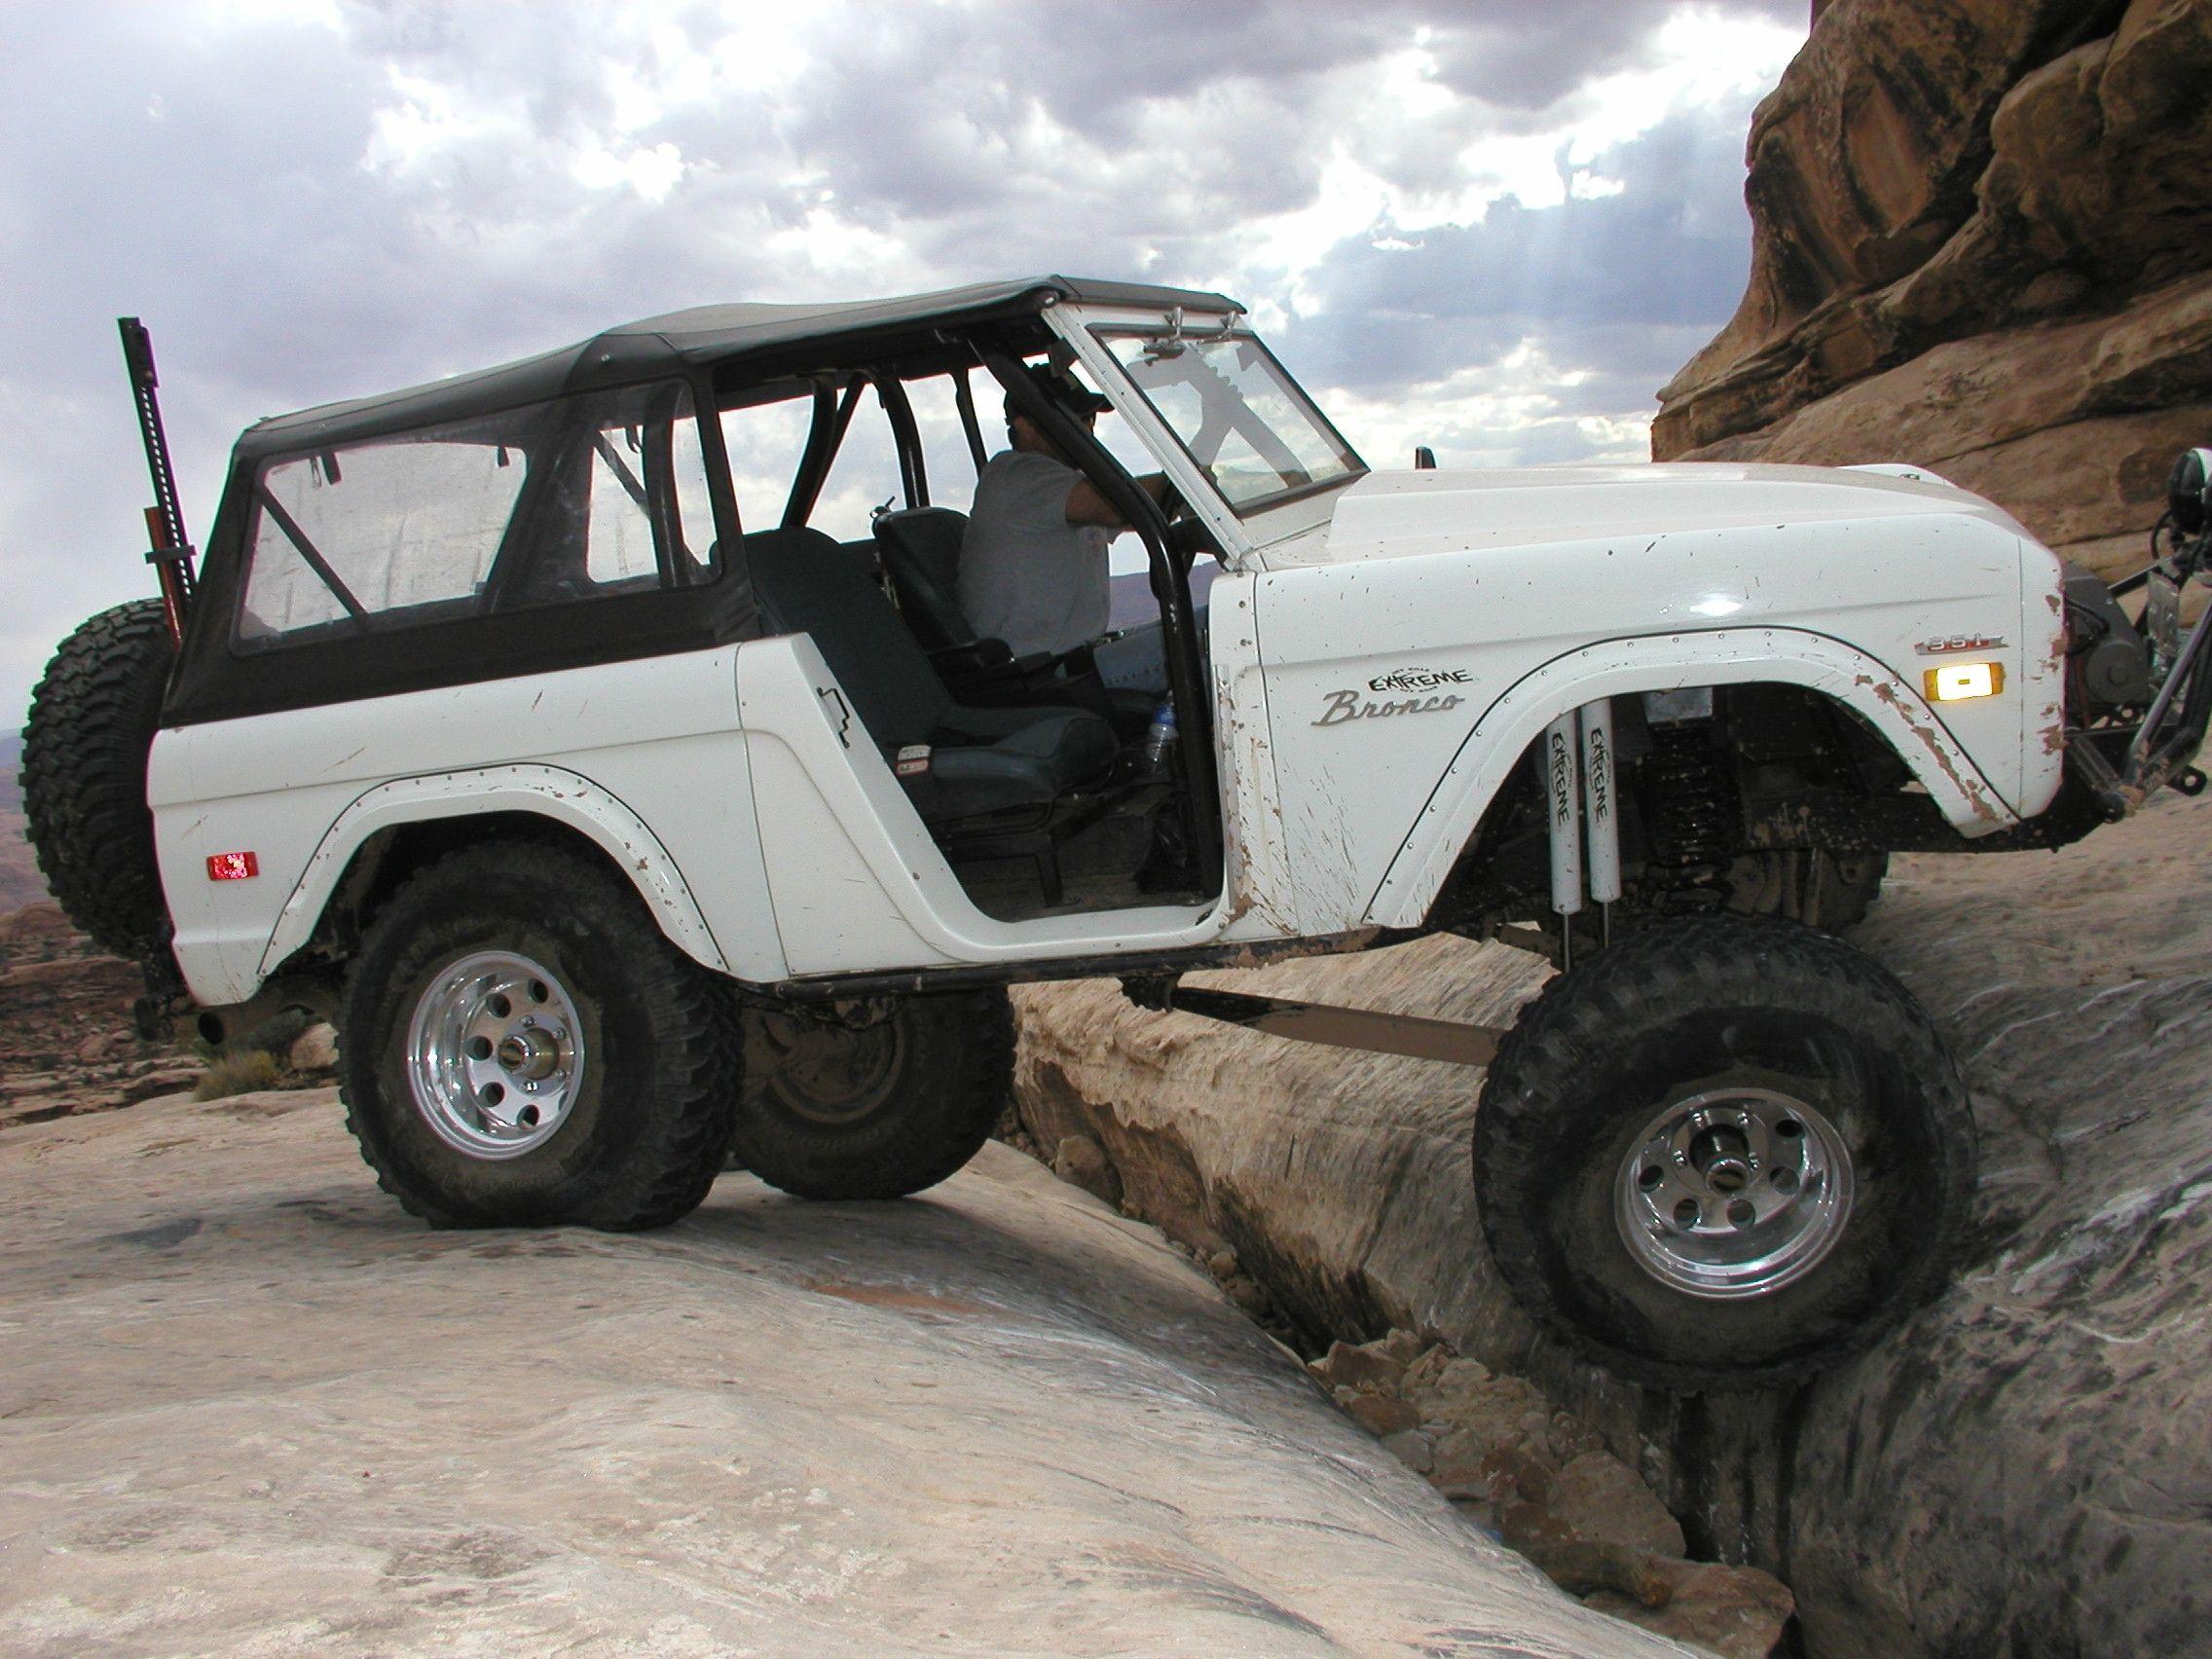 moab utah rock crawling | Classic bronco, Classic ford broncos, Ford bronco